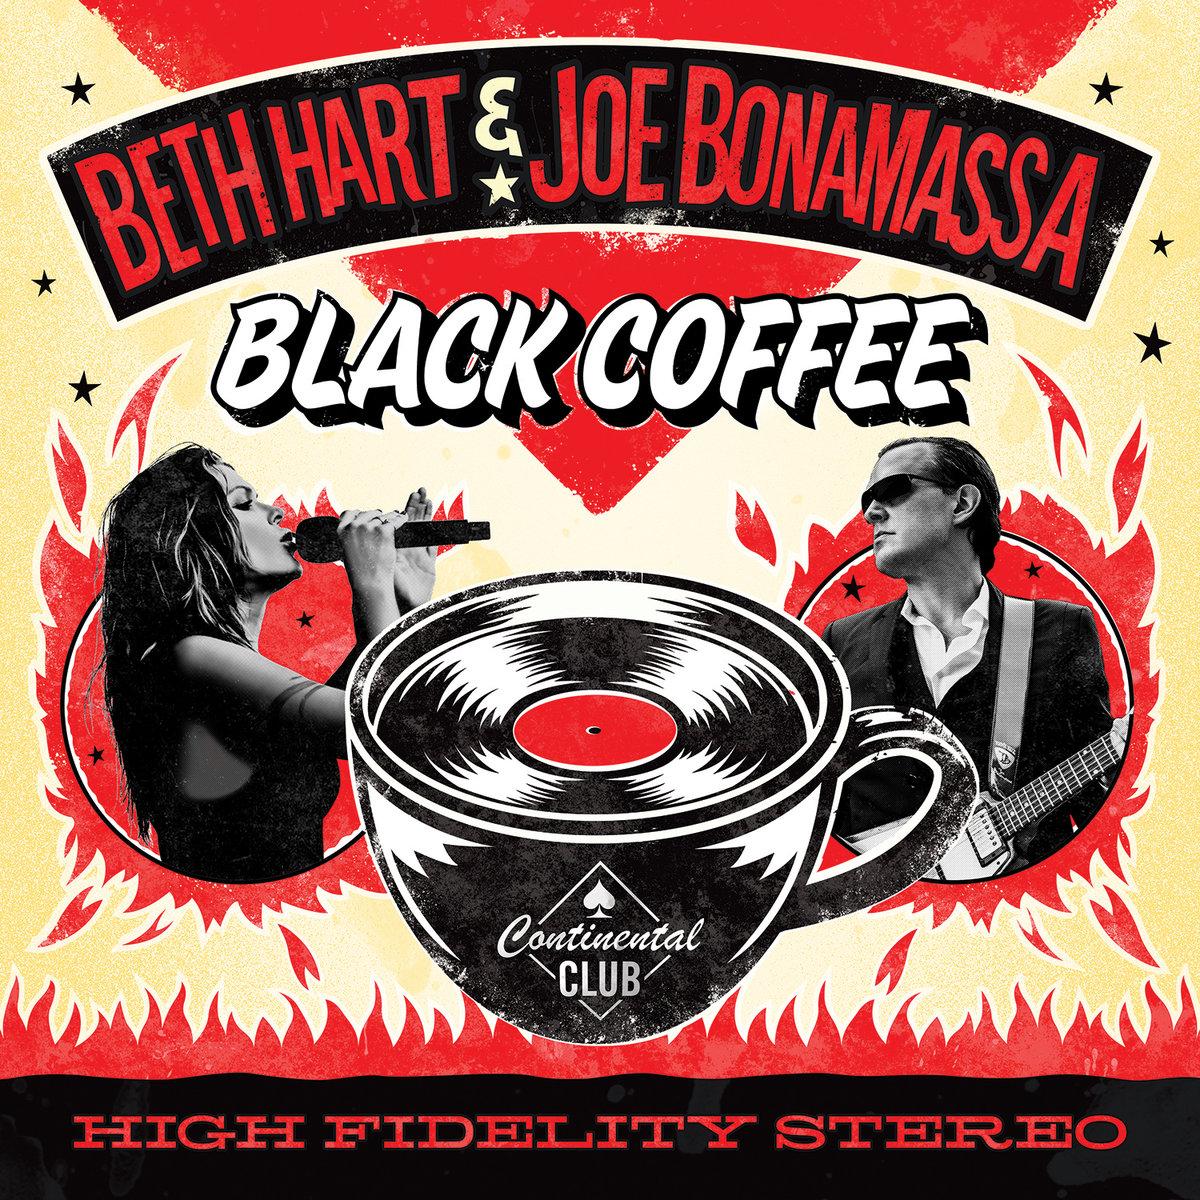 Hart, Bonamassa – Black Coffee